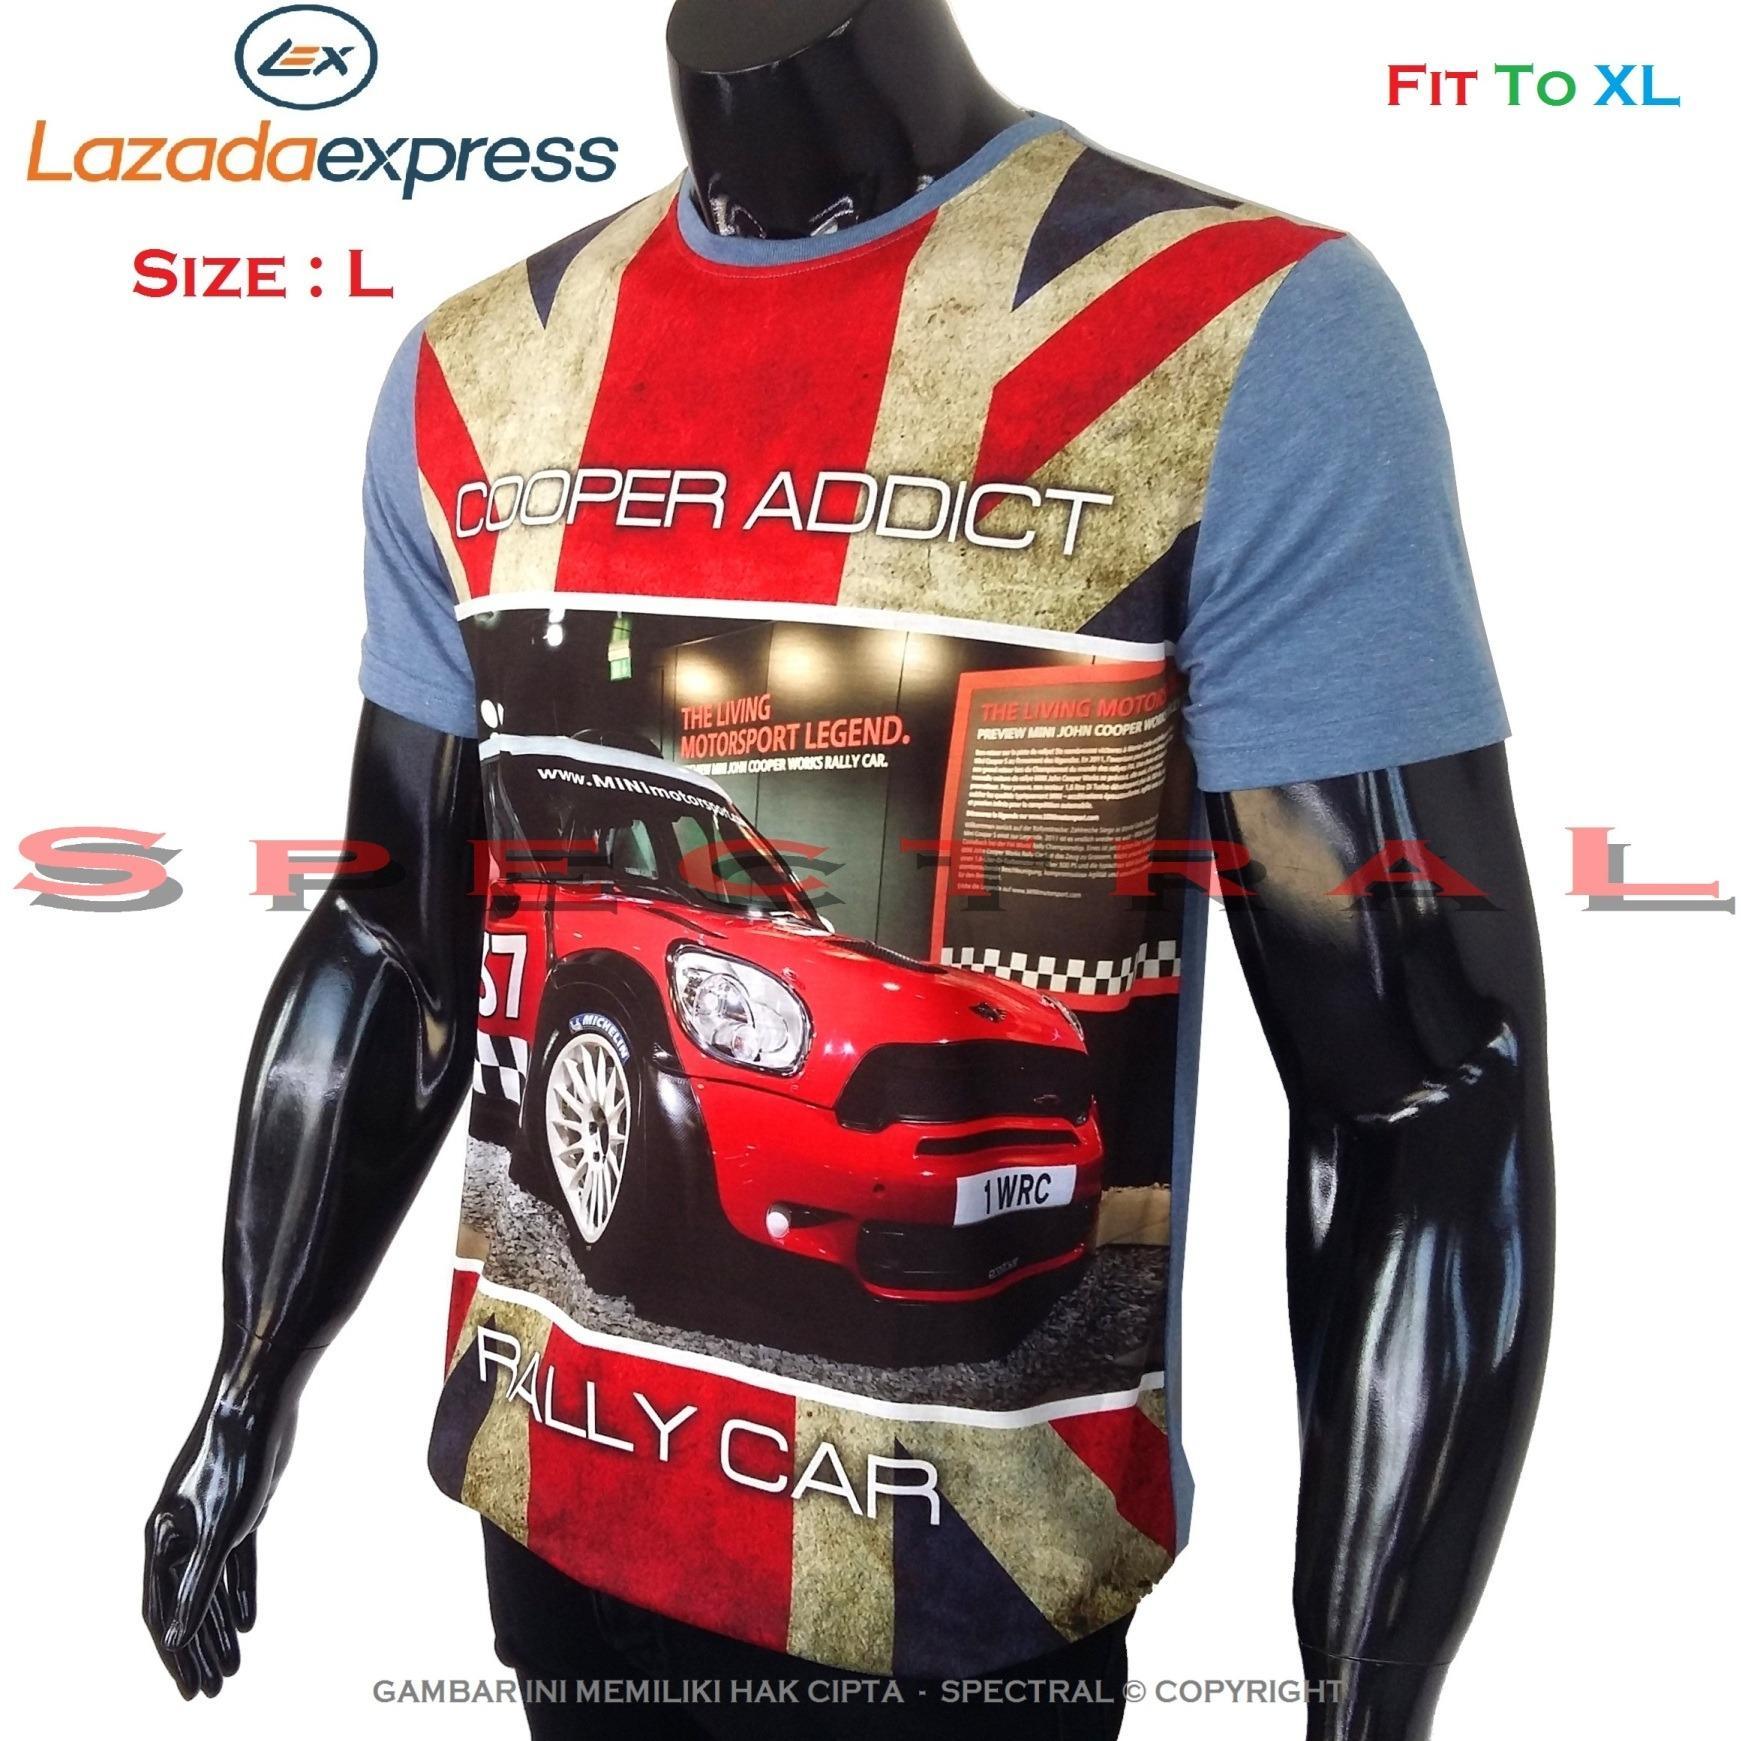 Spectral – 3D COPPER Kualitas HD Printing Size L Fit To XL Soft Rayon Viscose Kaos Distro Fashion T-Shirt Atasan Oblong Baju Pakaian Polos Shirt Pria Wanita Cewe Cowo Lengan Murah Bagus Keren Jaman Kekinian Jakarta Bandung Gambar Mobil Mini Otomotif